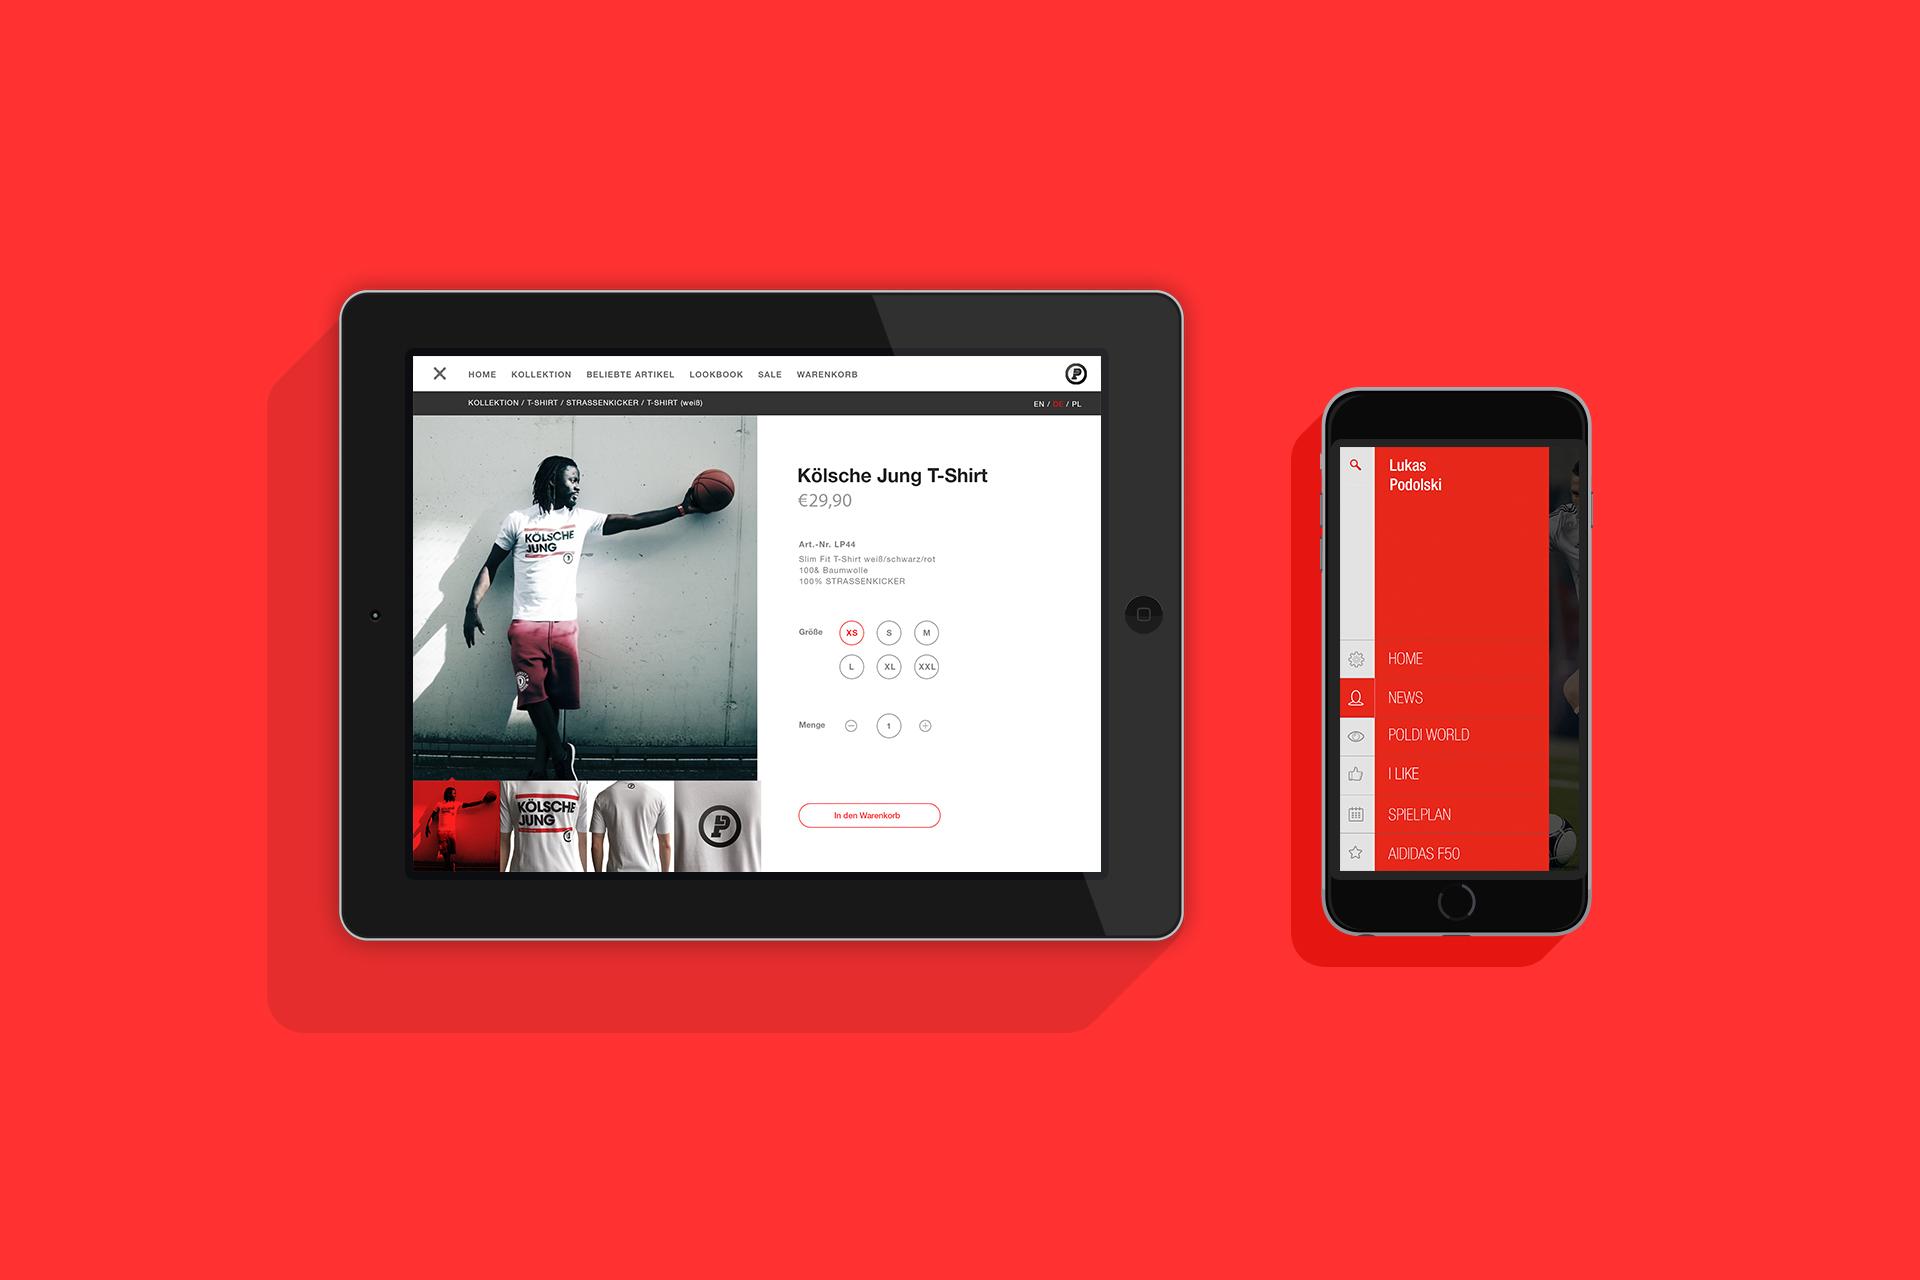 Projekt Lukas Podolski App und Online Shop - Jan-Philipp Alker - Designer - Südsolutions